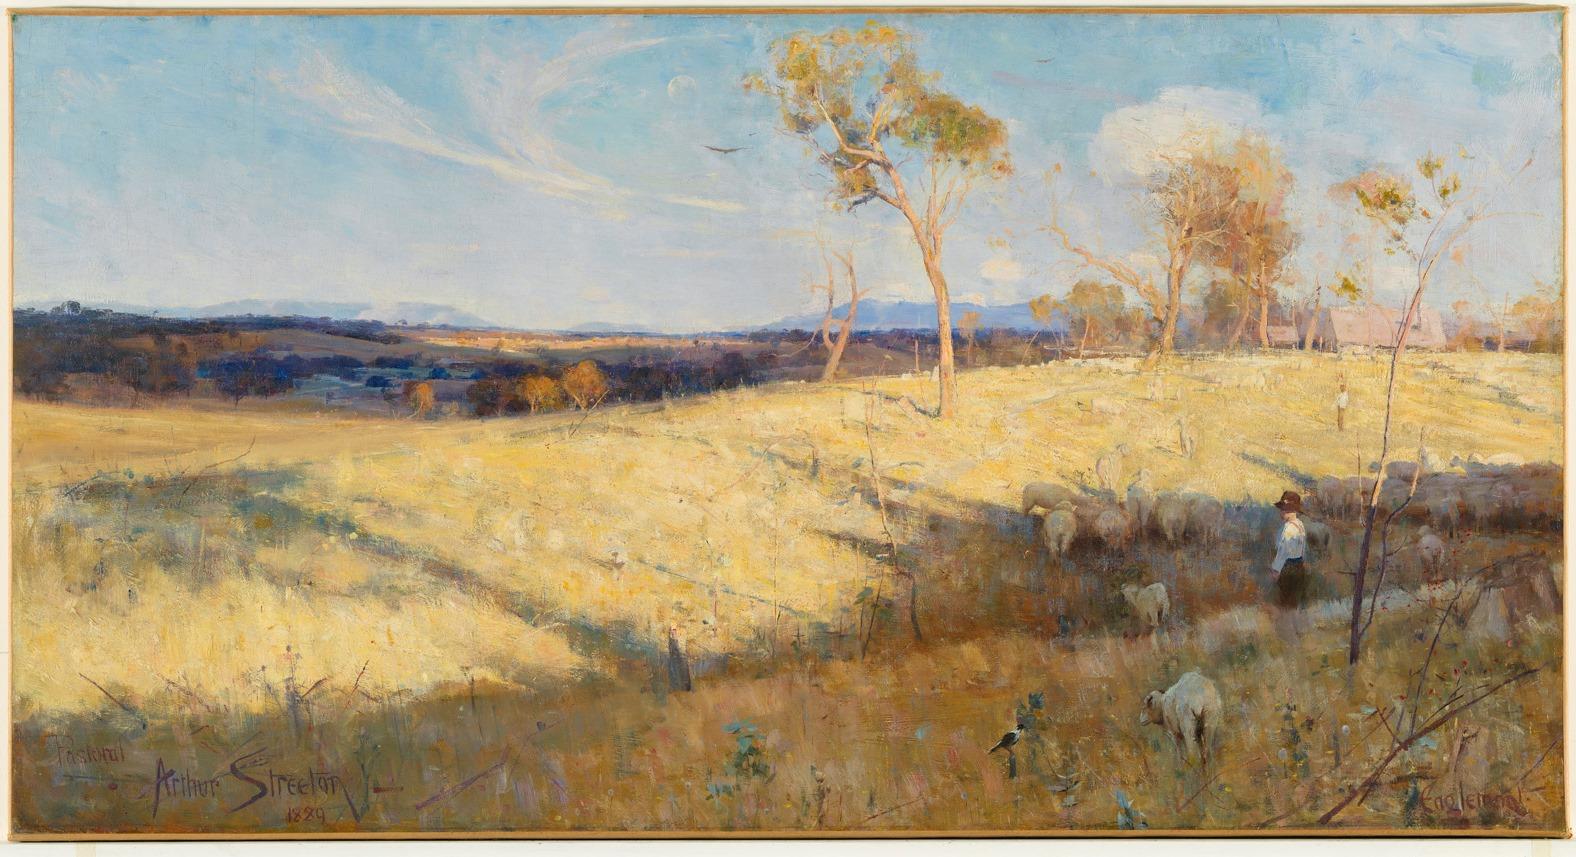 Arthur Streeton, Golden Summer, Eaglemont , 1889 Oil on canvas 81.3 × 152.6 National Gallery of Australia, CanberraPurchased 1995 © National Gallery of Australia, Canberra